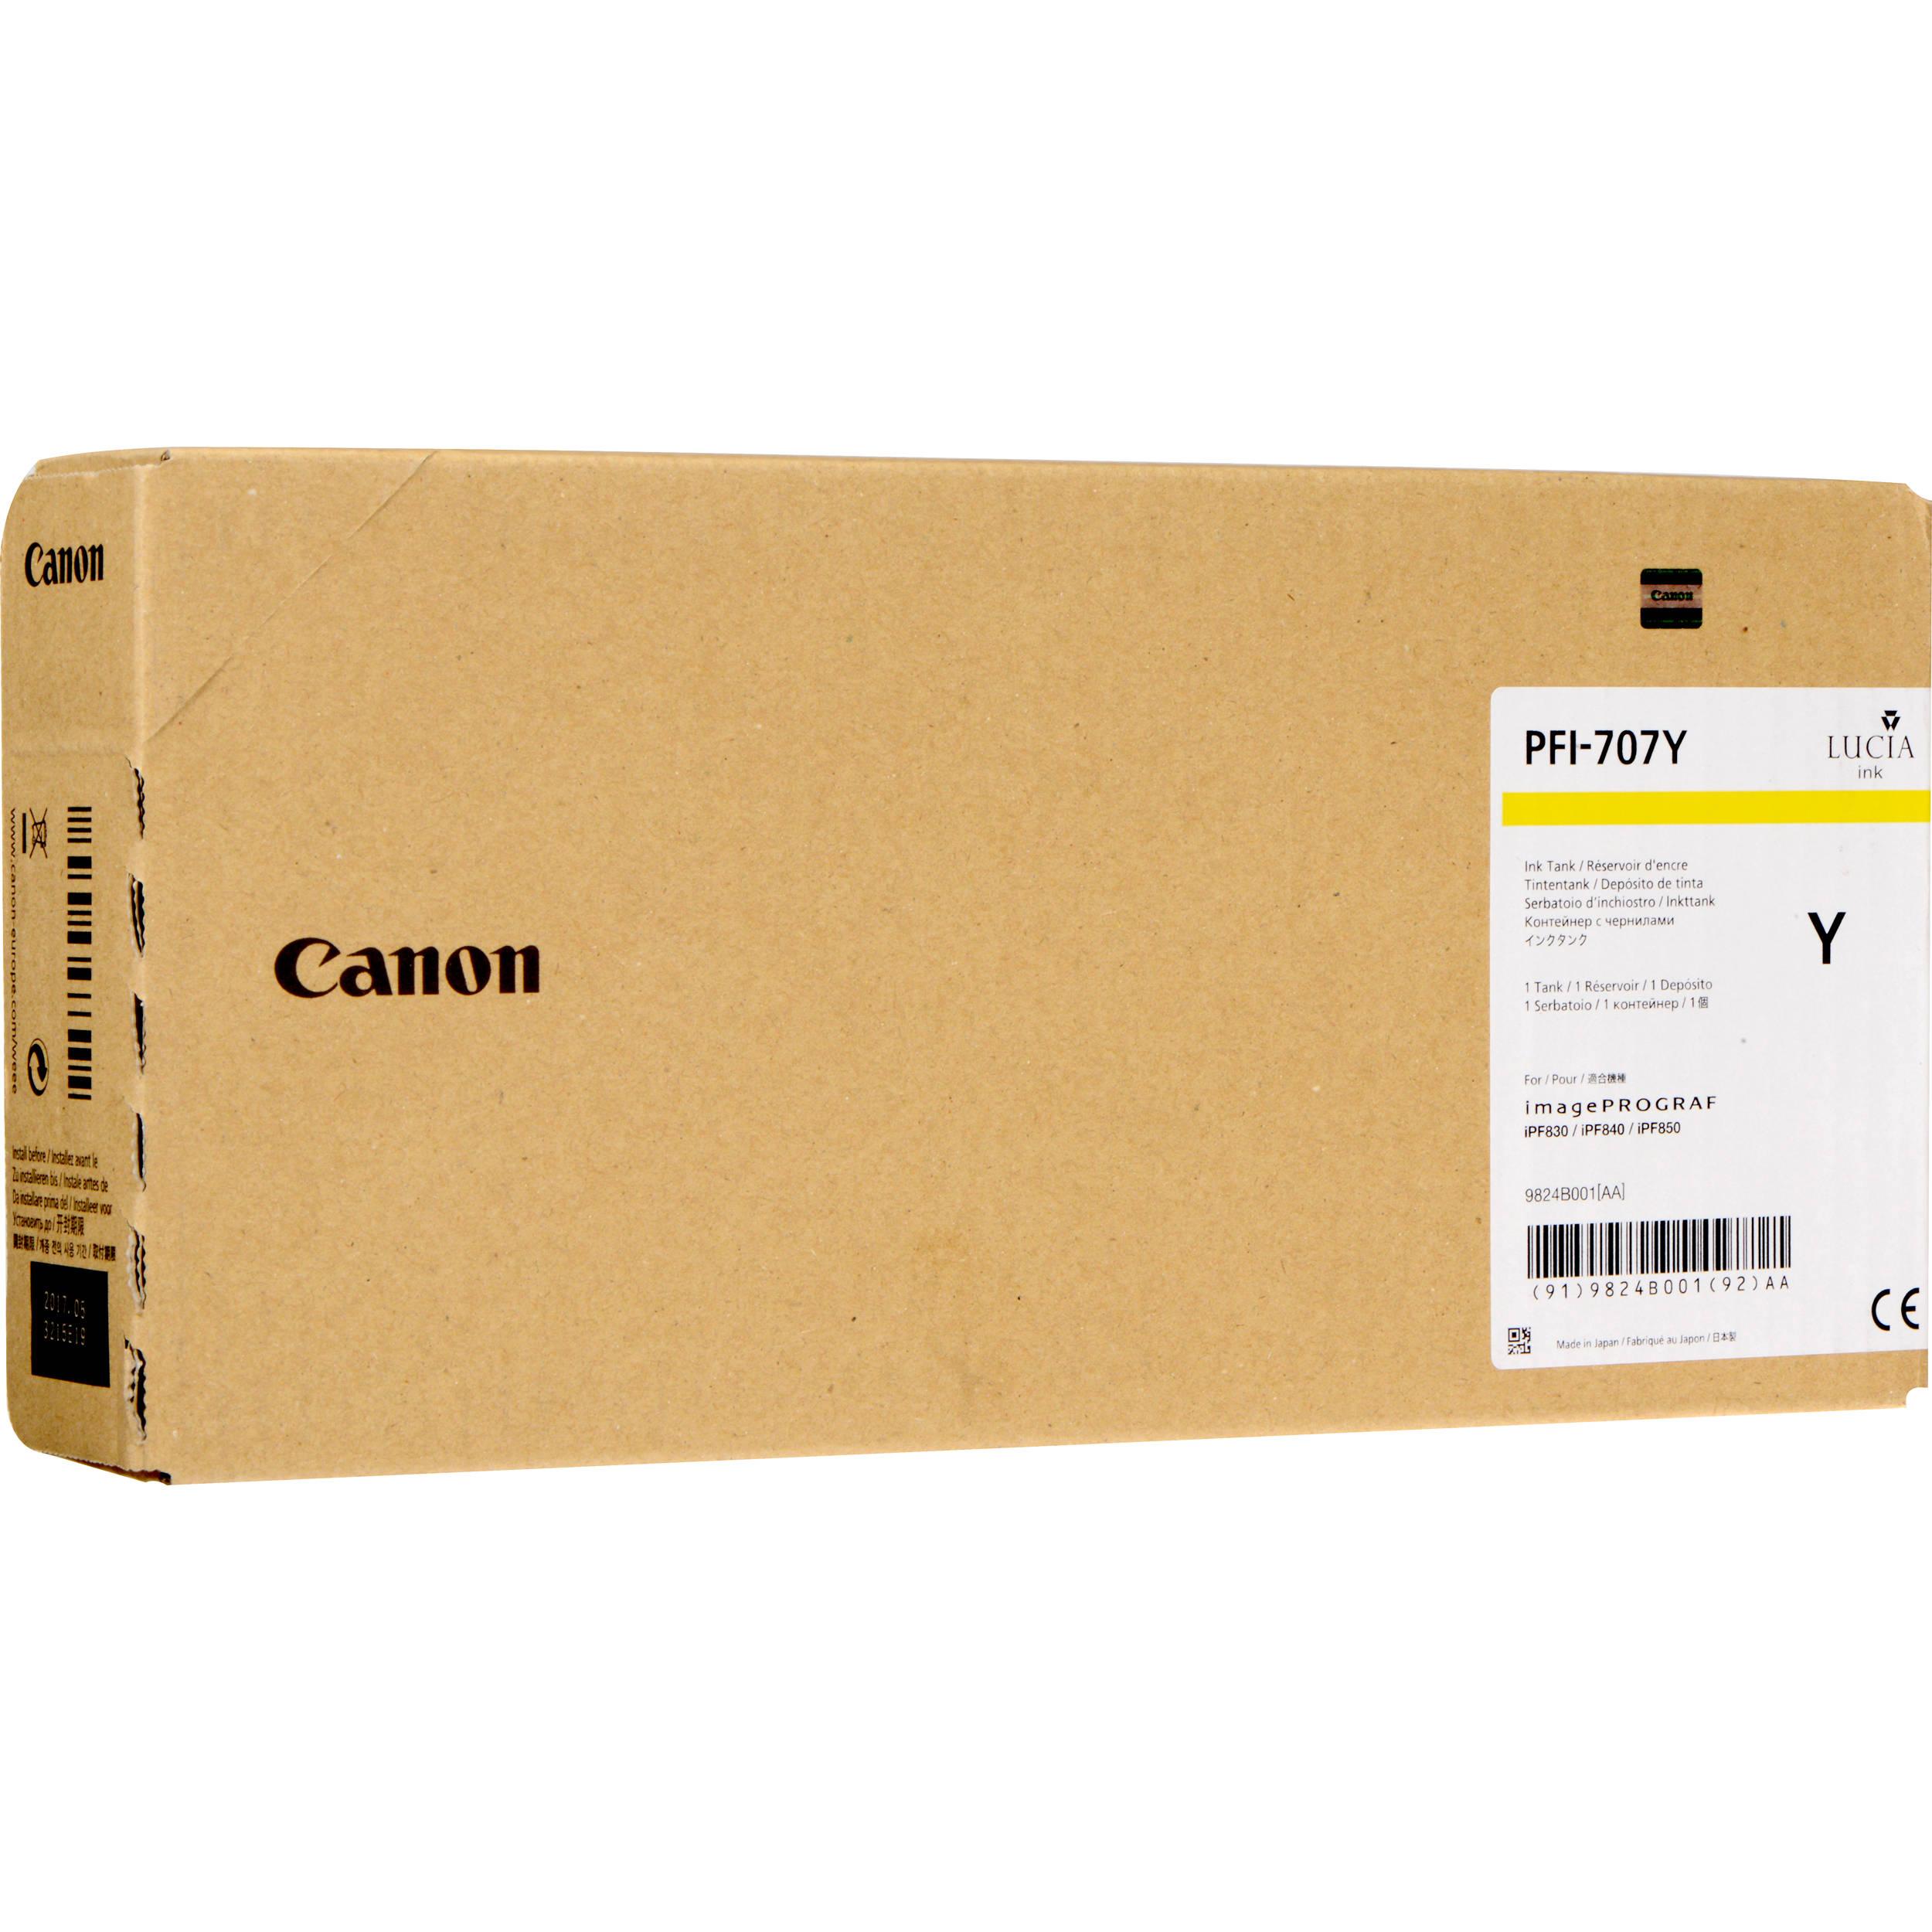 Cartus Inkjet Canon PFI-707Y Galben 700ml